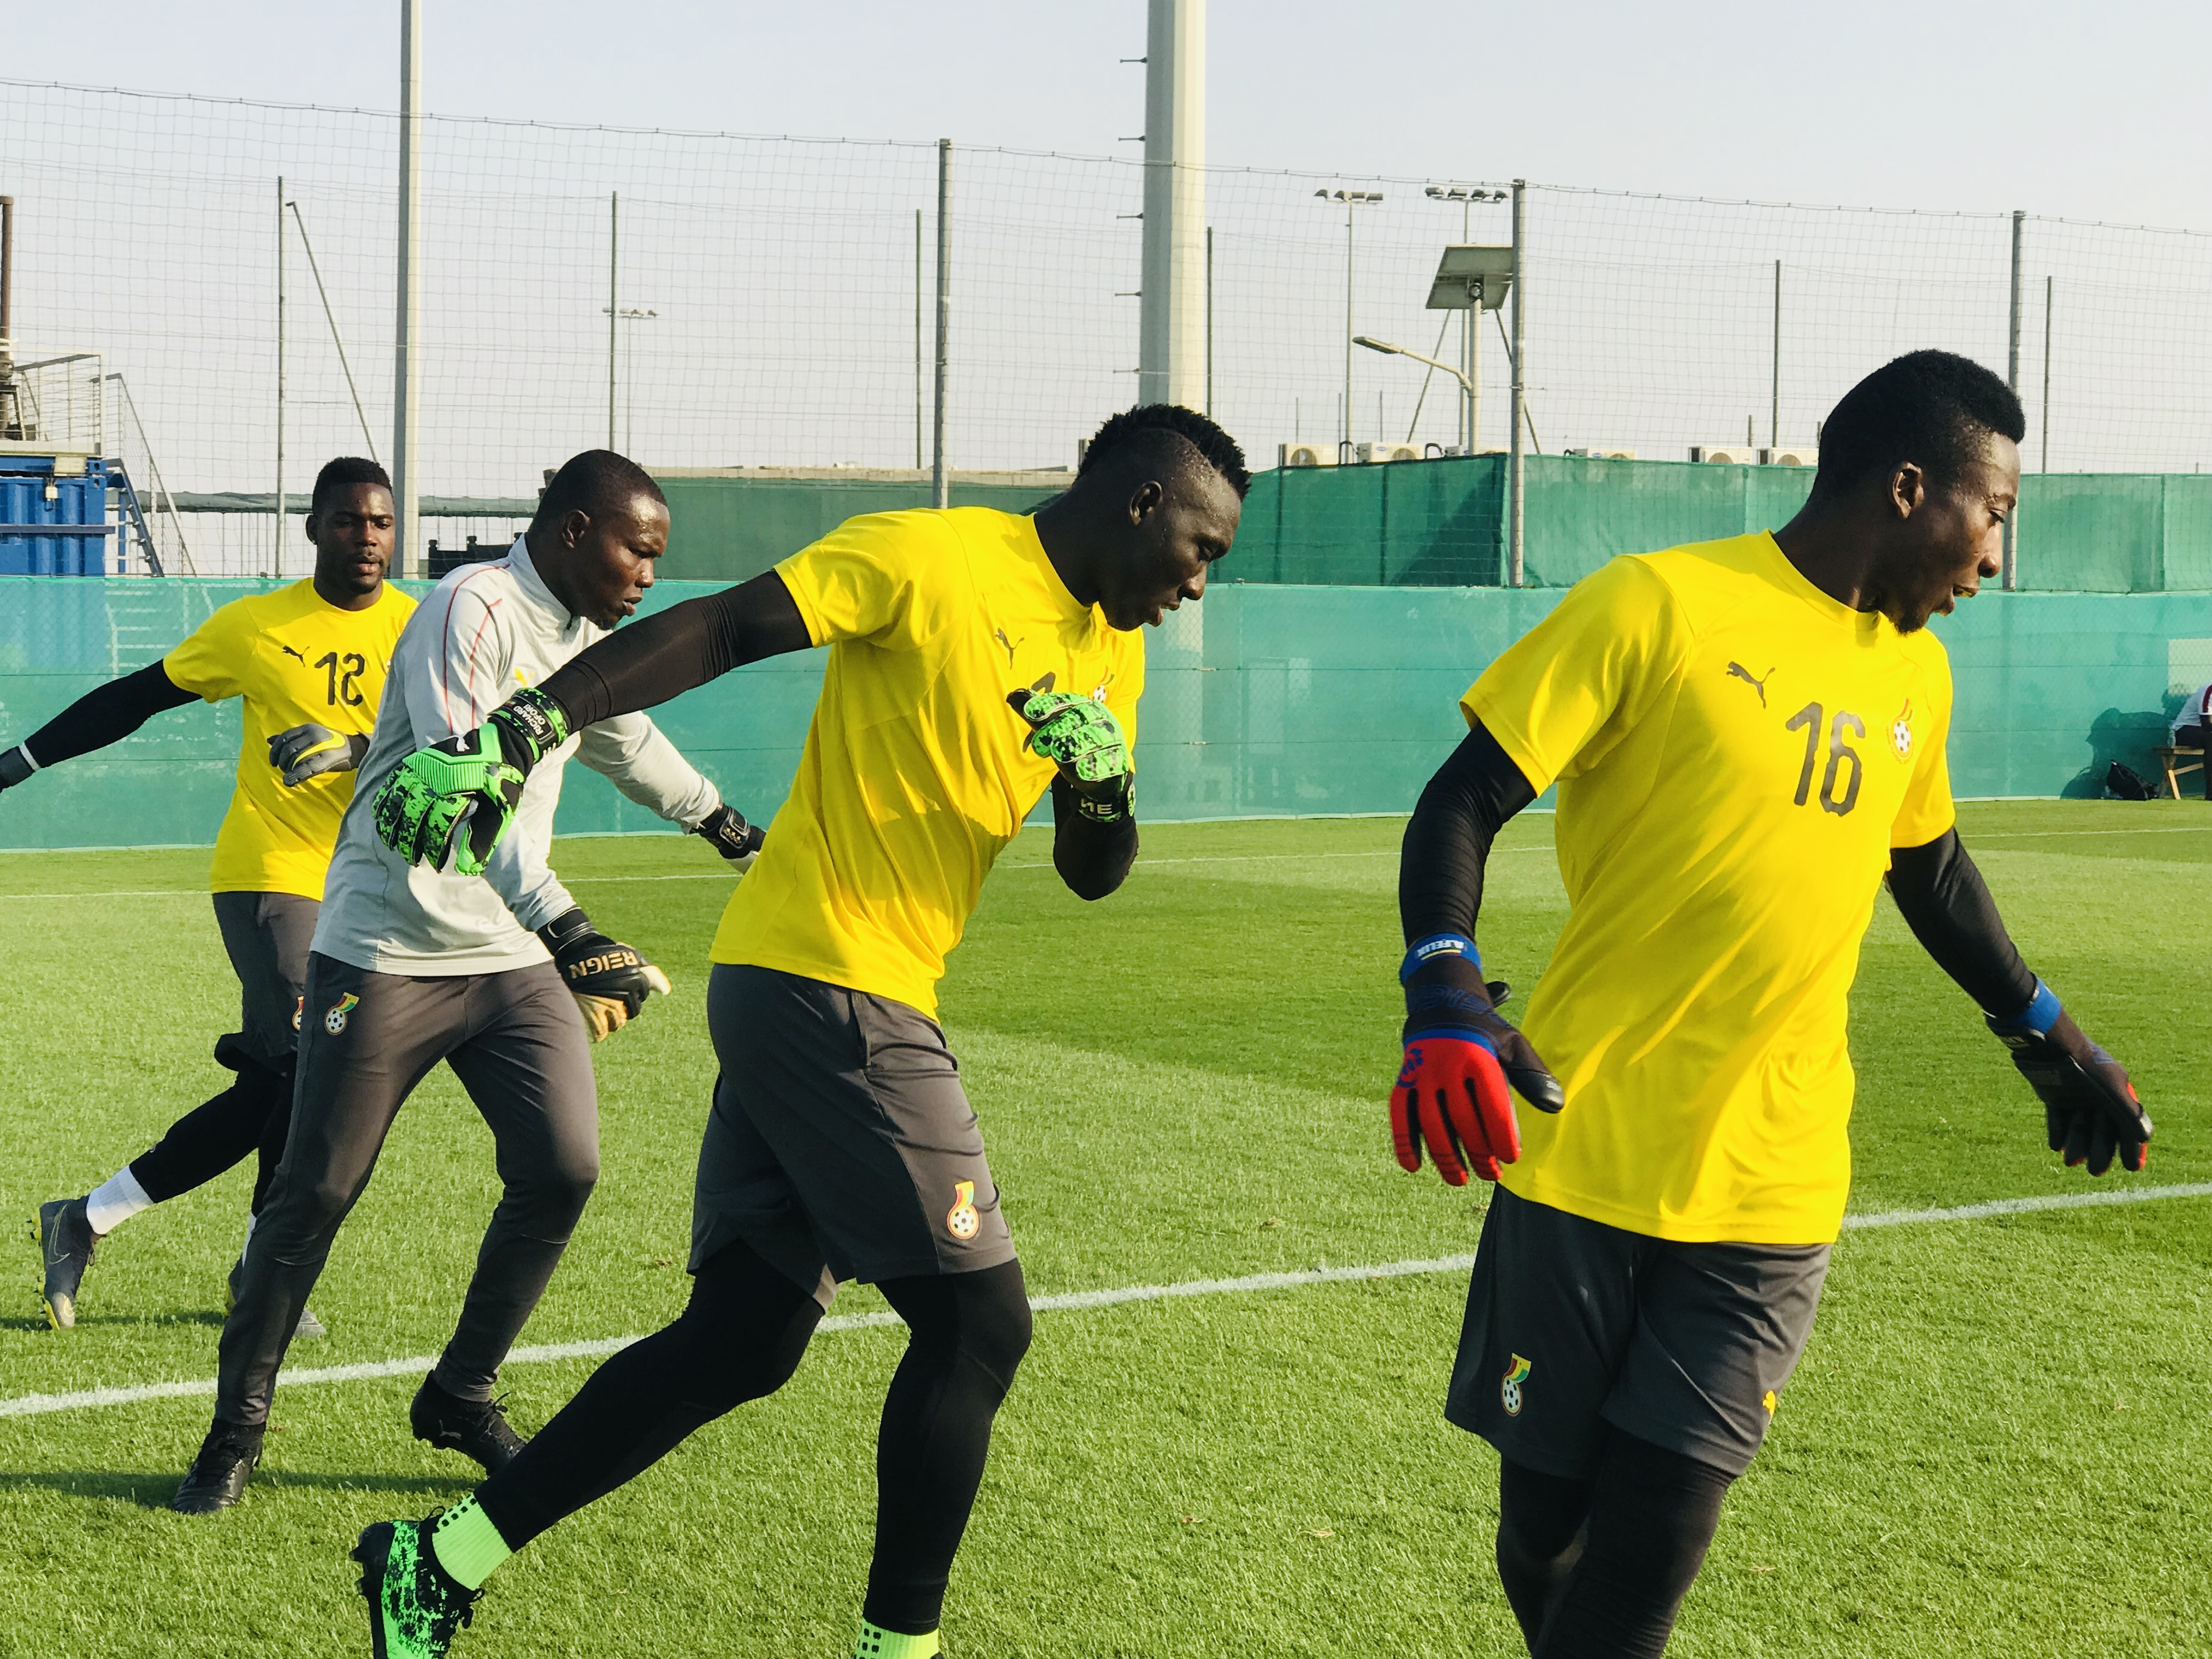 Omani referees to handle Black Stars vs Namibia friendly on Sunday